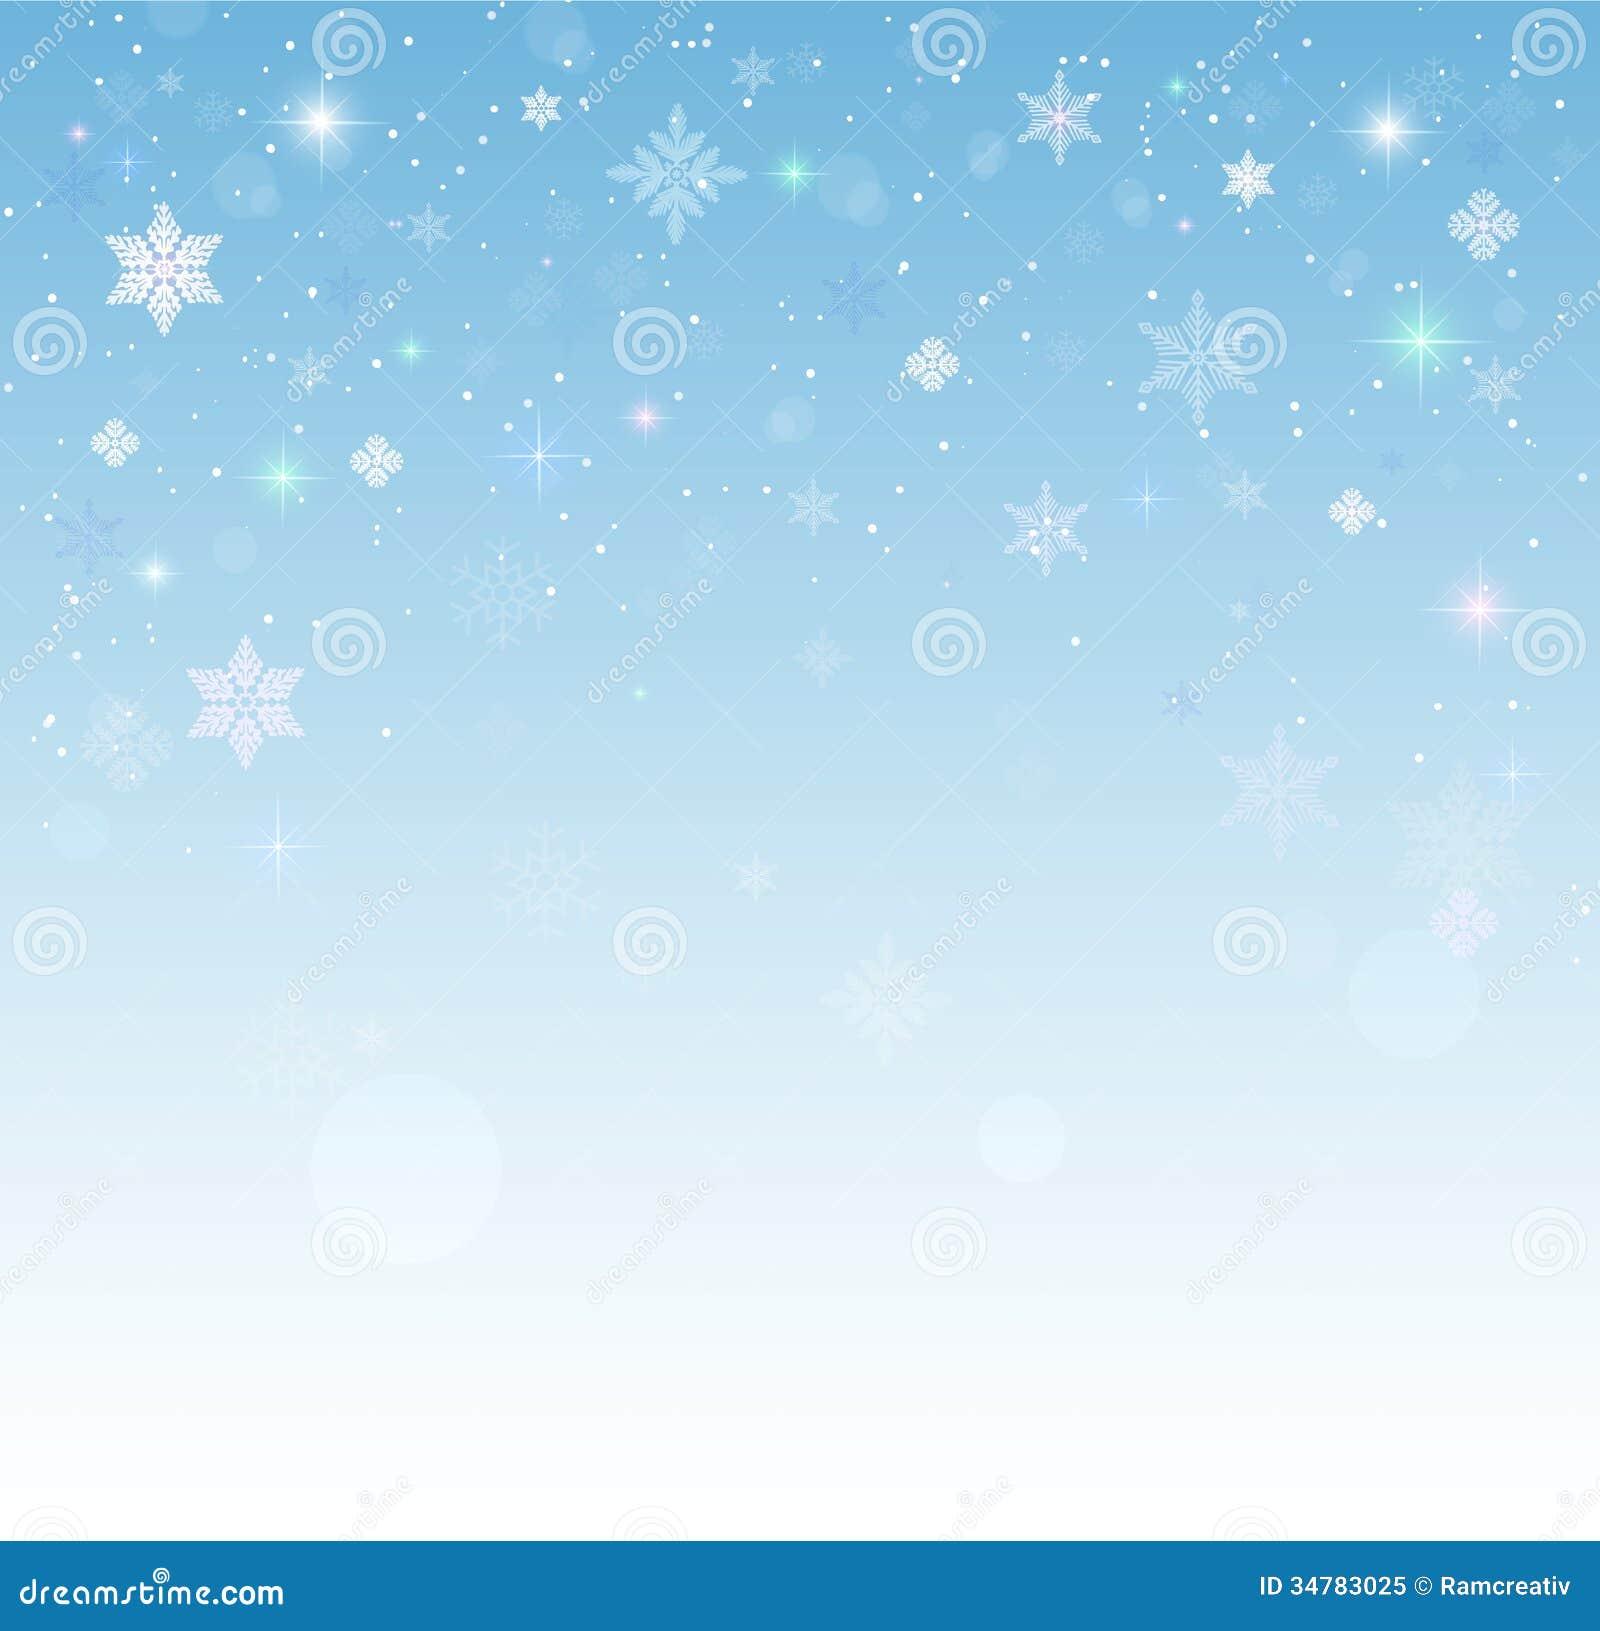 Falling Snow Wallpaper